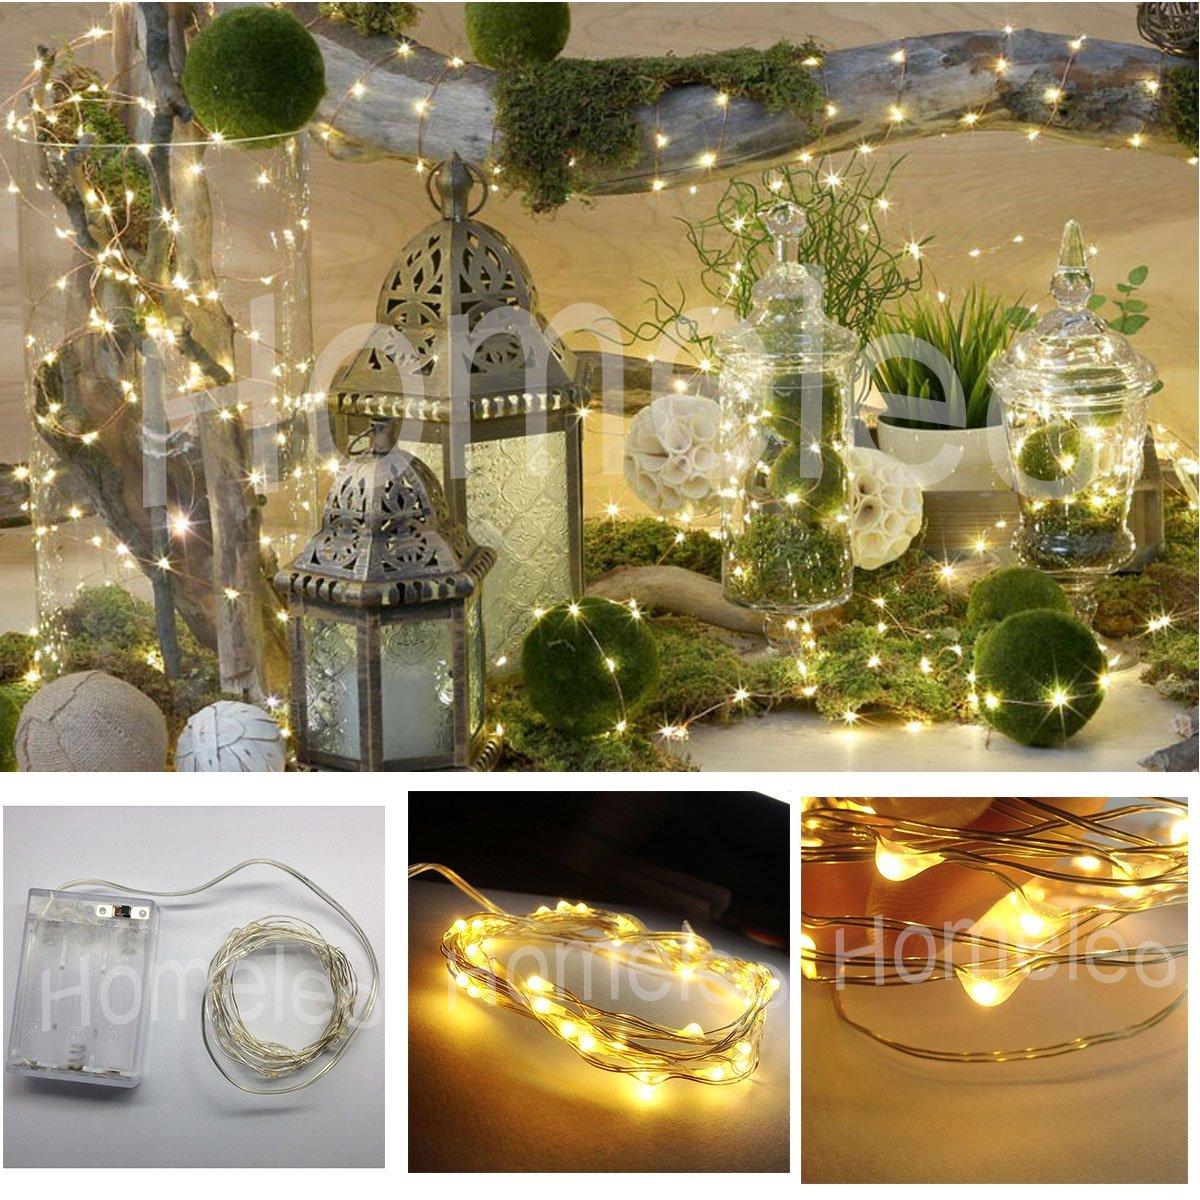 Homeleo 2m 20 Leds Warm White Led Strings 3xaa Battery Operated Mini String Lights Flexible